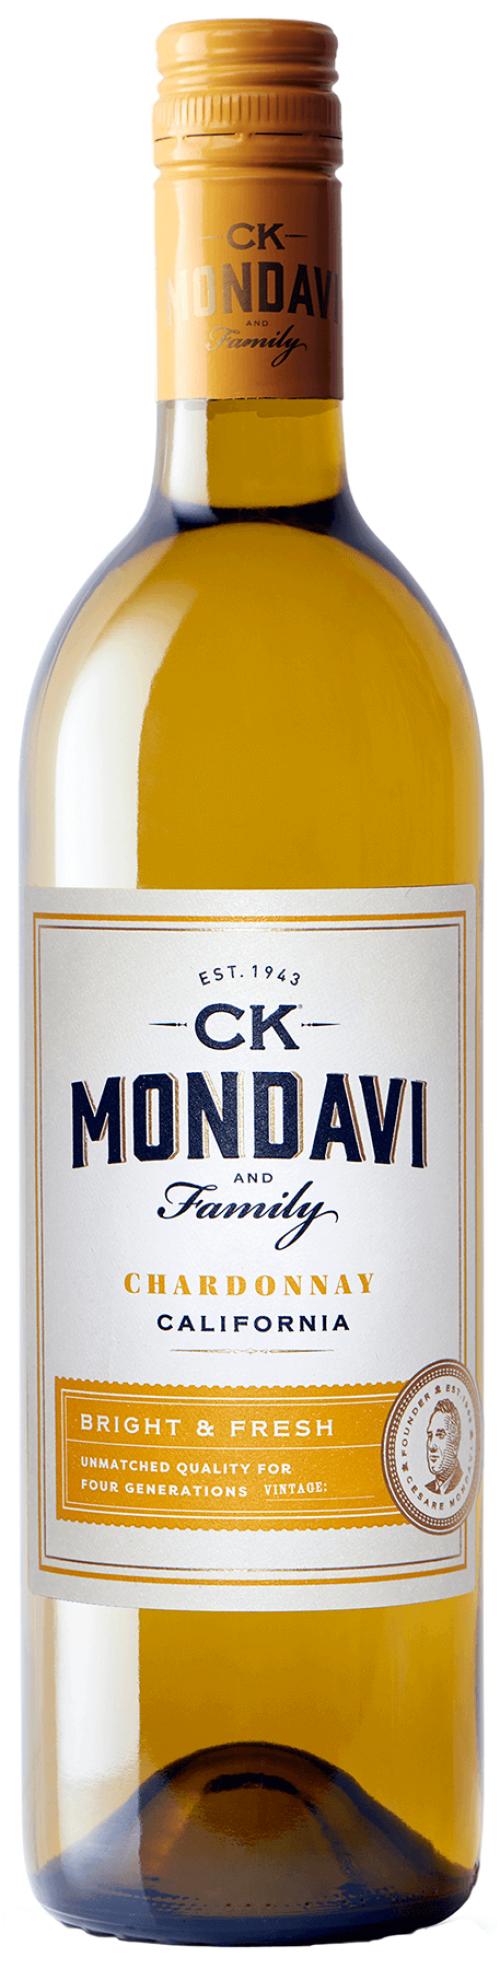 2018 C.K. Mondavi Chardonnay 750ml